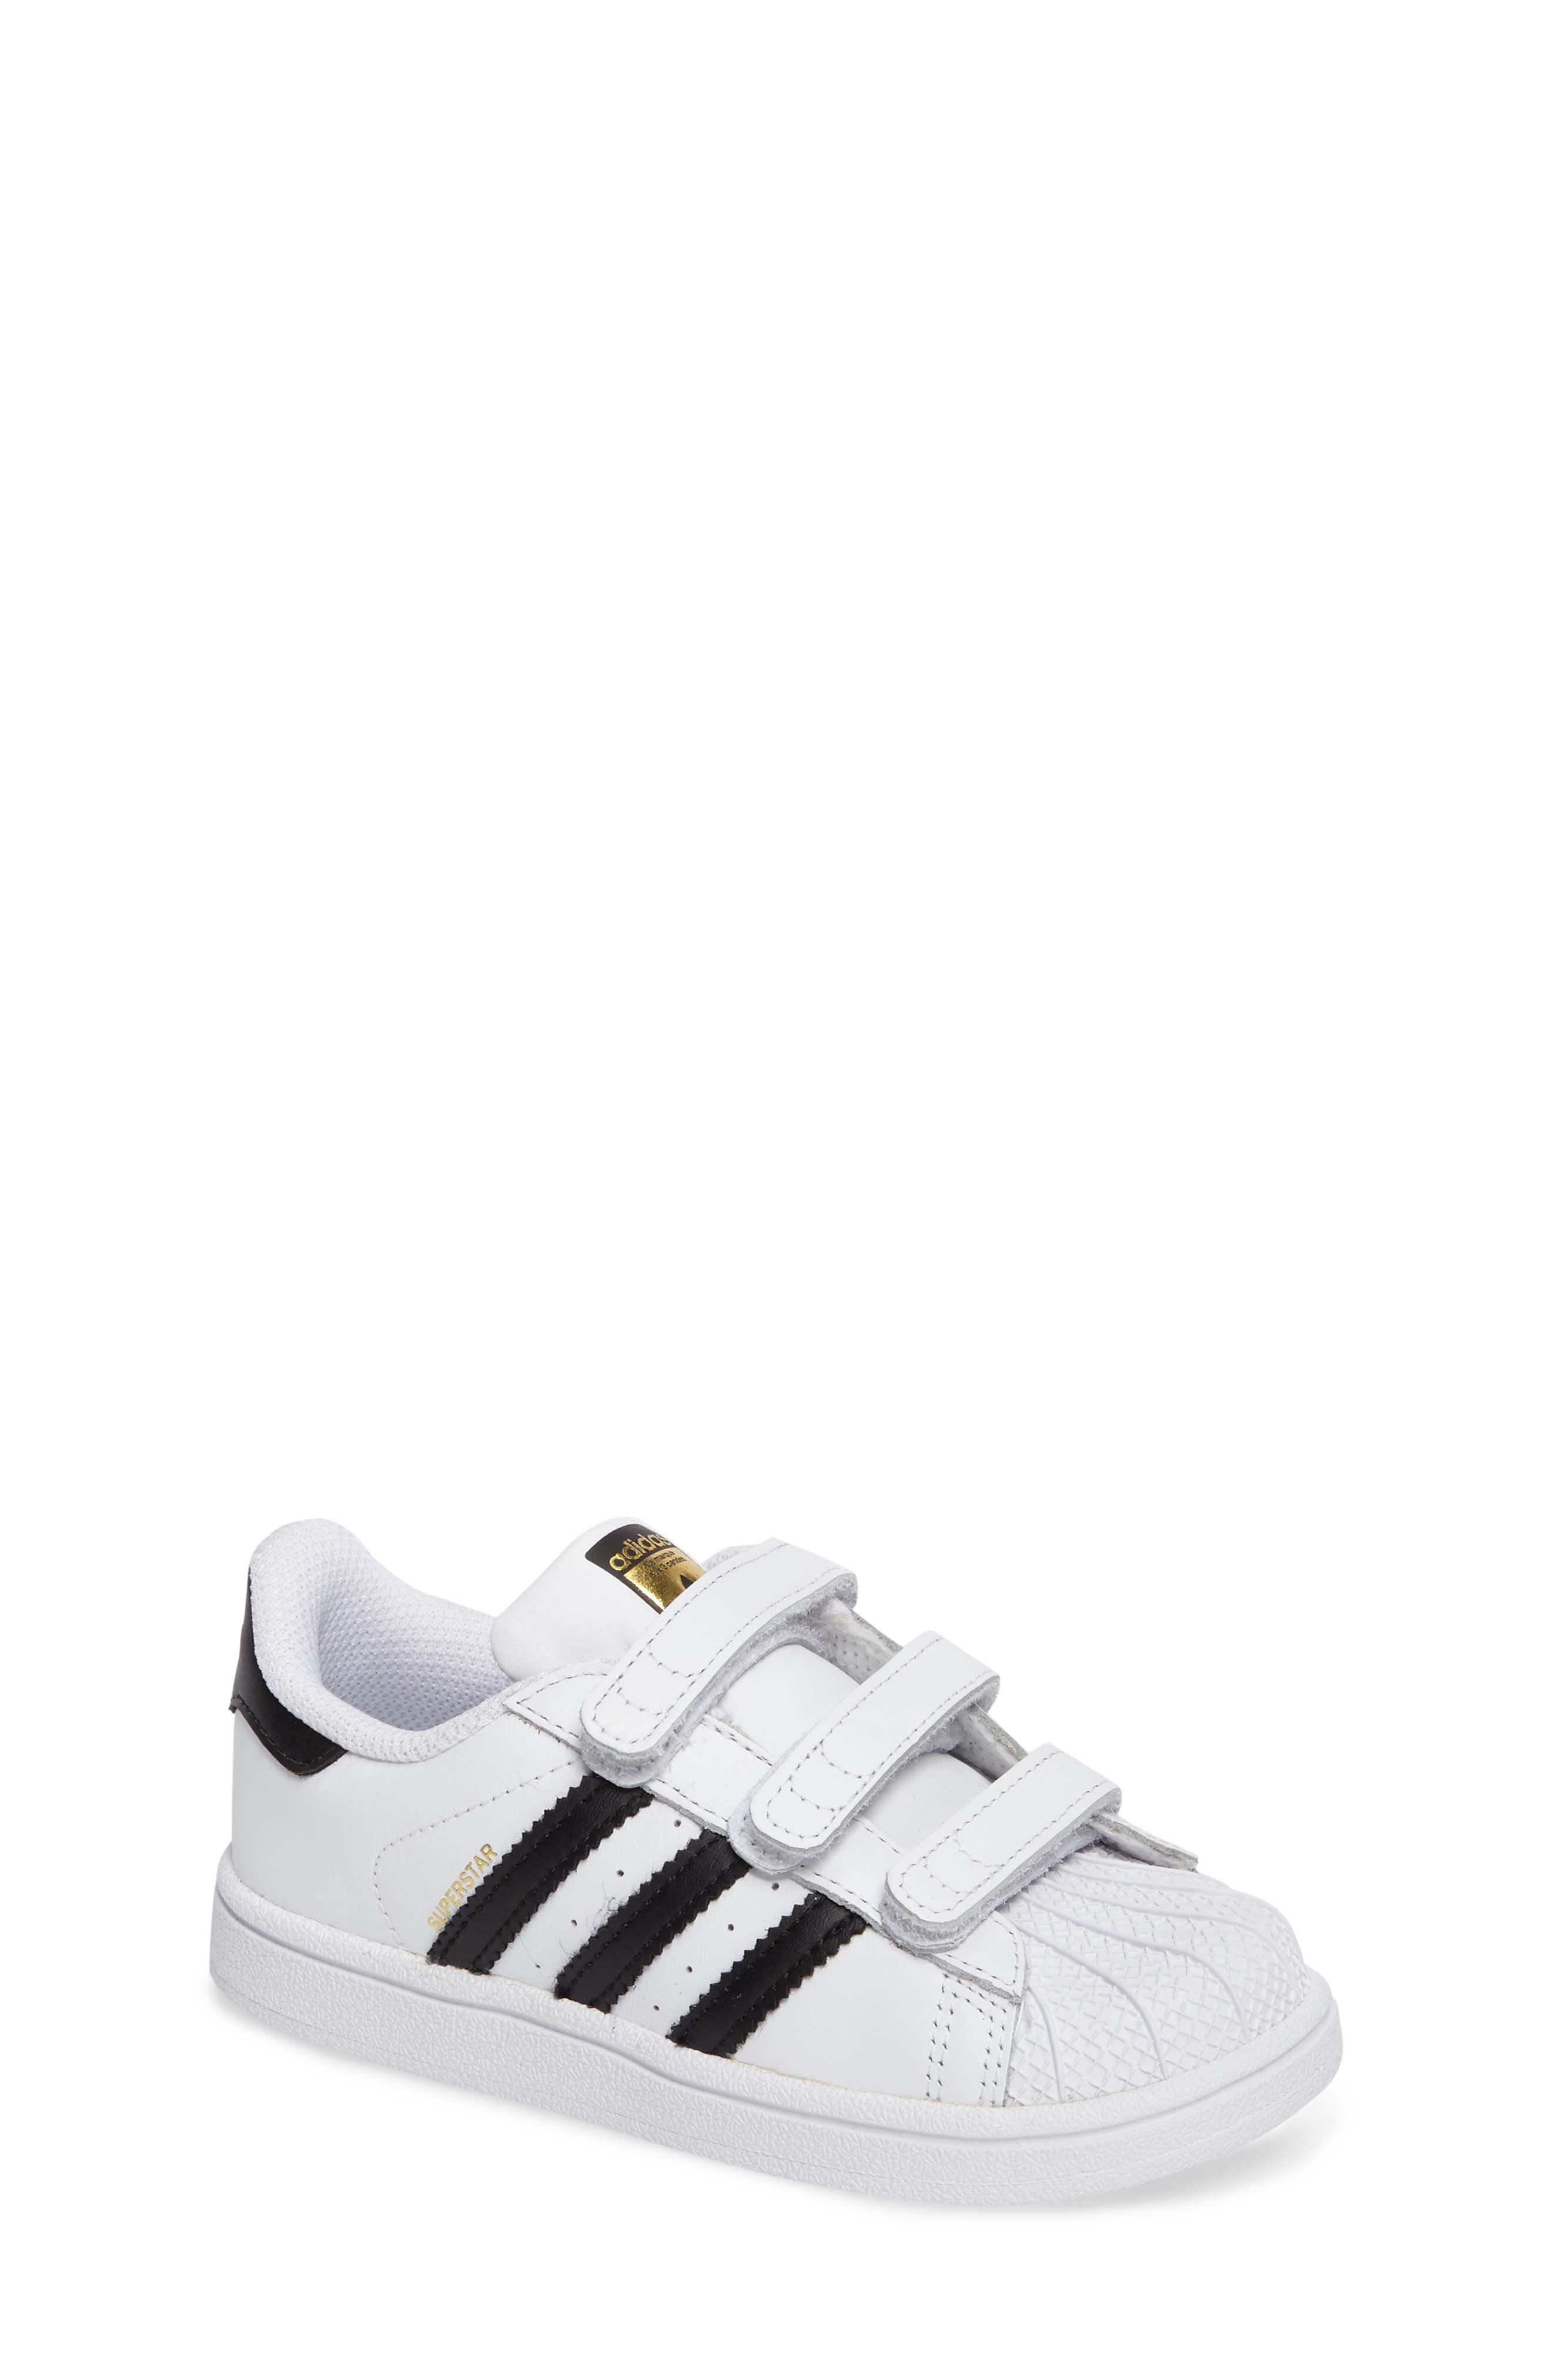 ADIDAS Superstar Sneaker, Main, color, WHITE/ BLACK/ WHITE